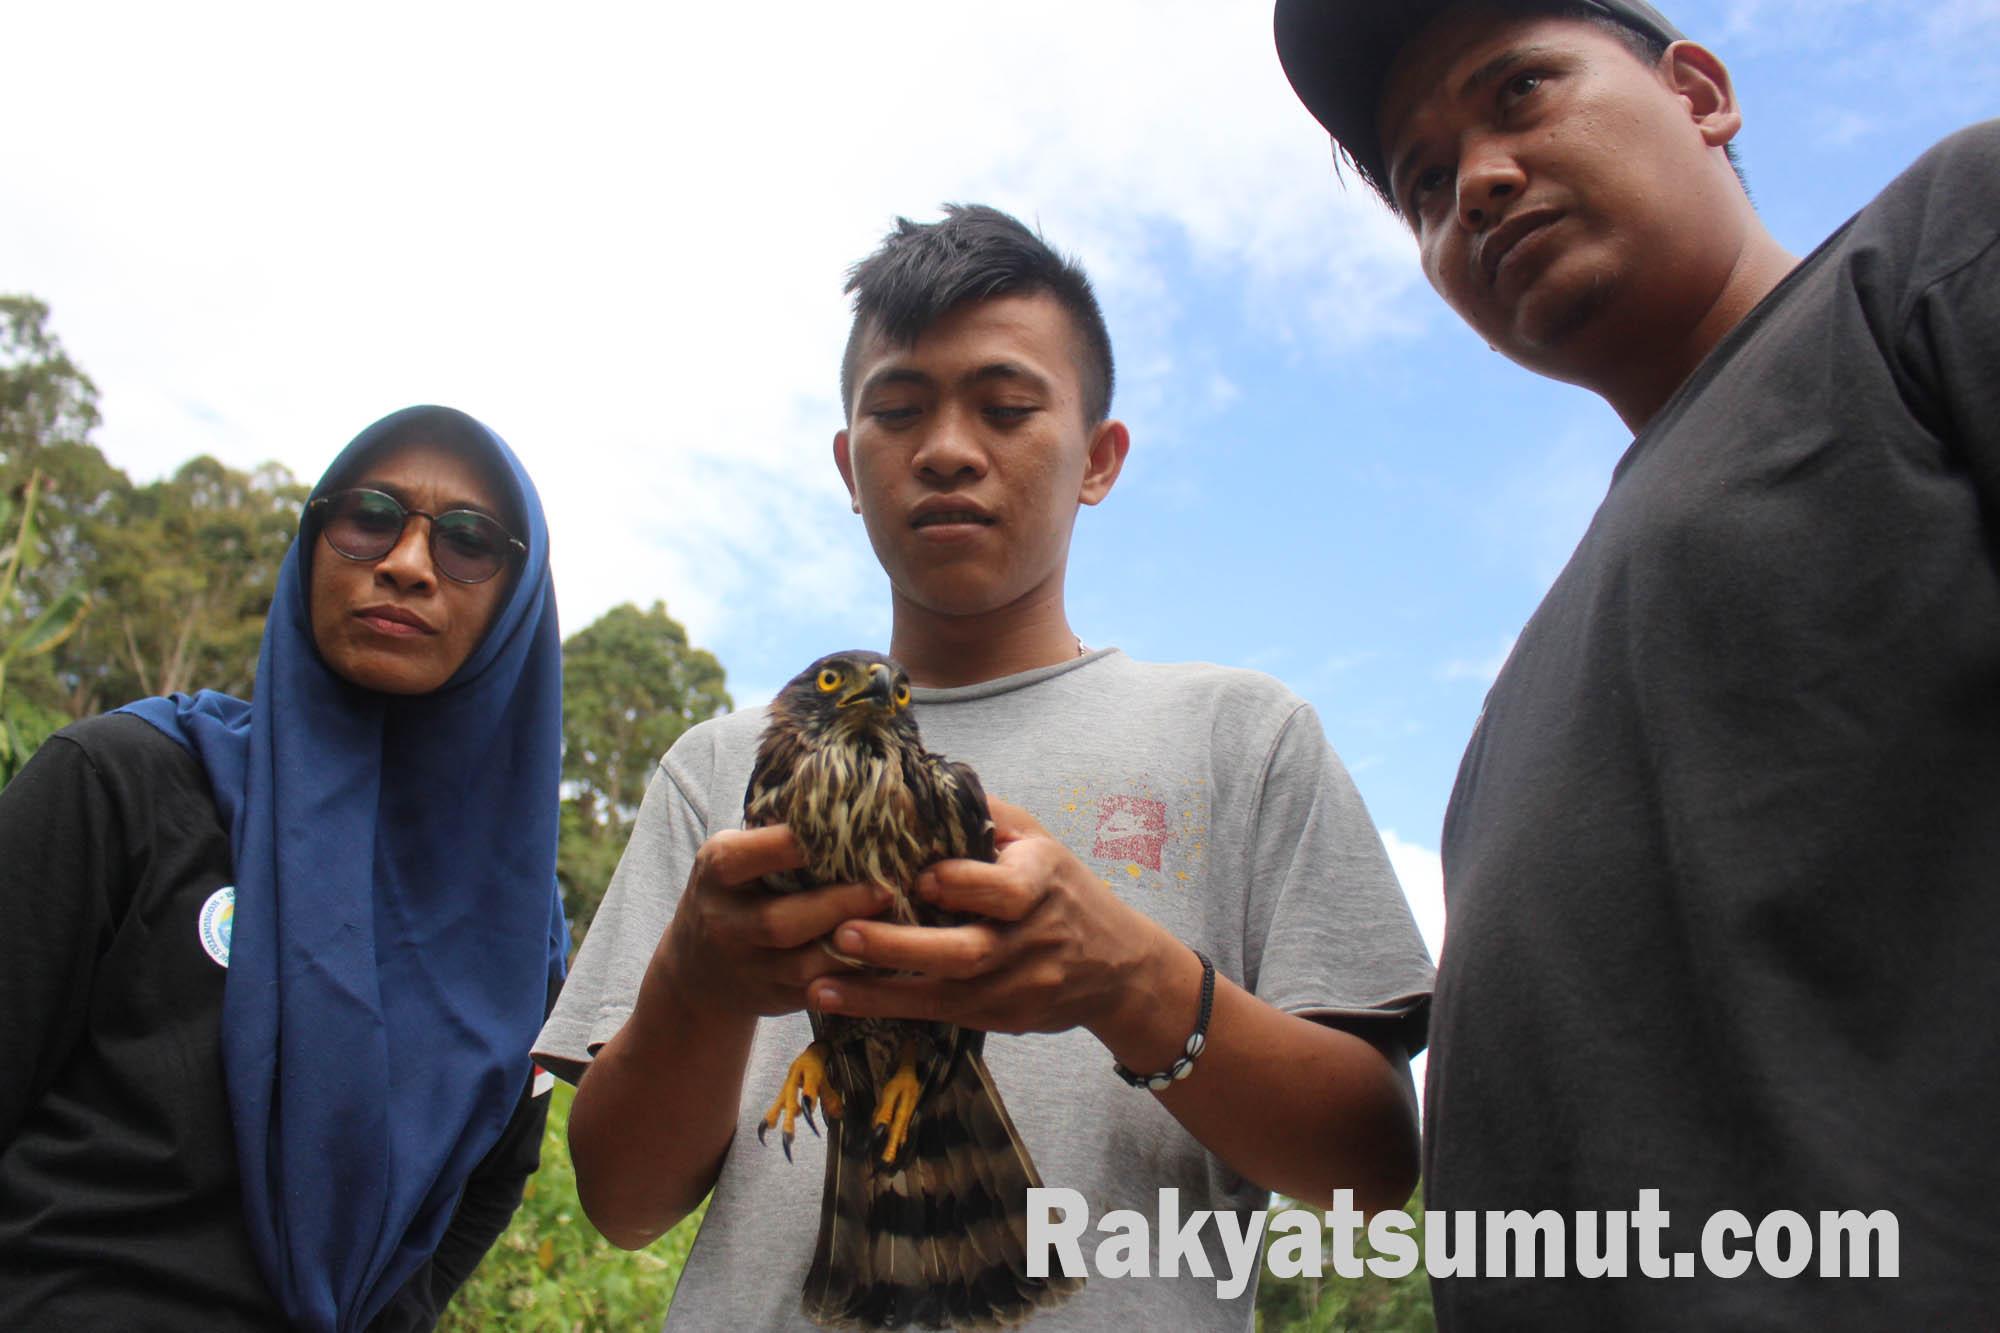 Belzasar Sitompul didampingi pengurus Komunitas Menjaga Pantai Barat (Komantab) saat merilis kembali Elang Alap Jambul di DeSKa. Foto: Rakyatsumut.com